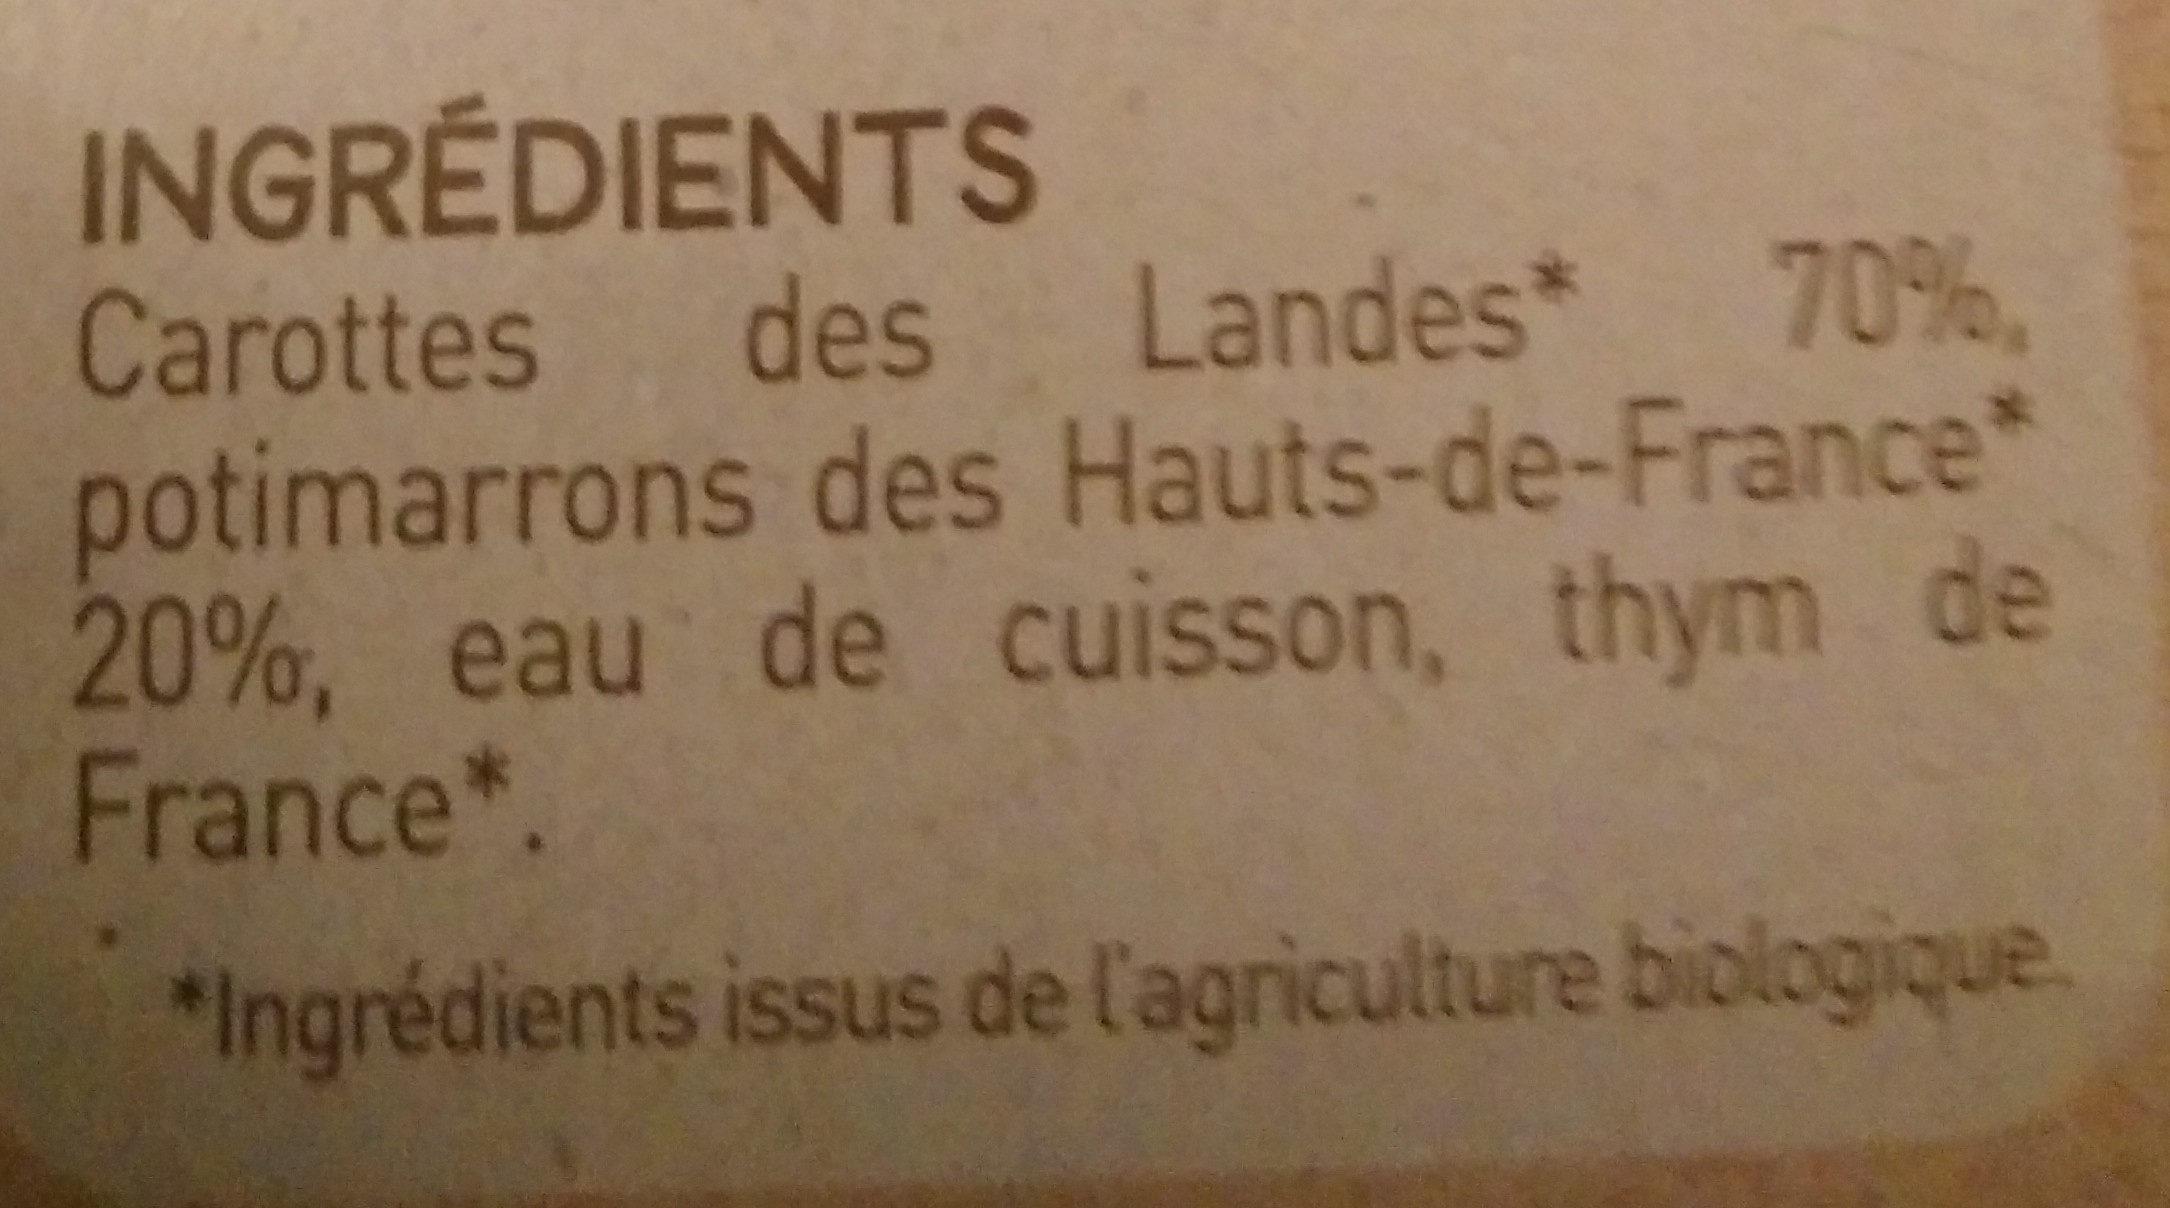 Carottes des Landes potimarron - Ingrédients - fr